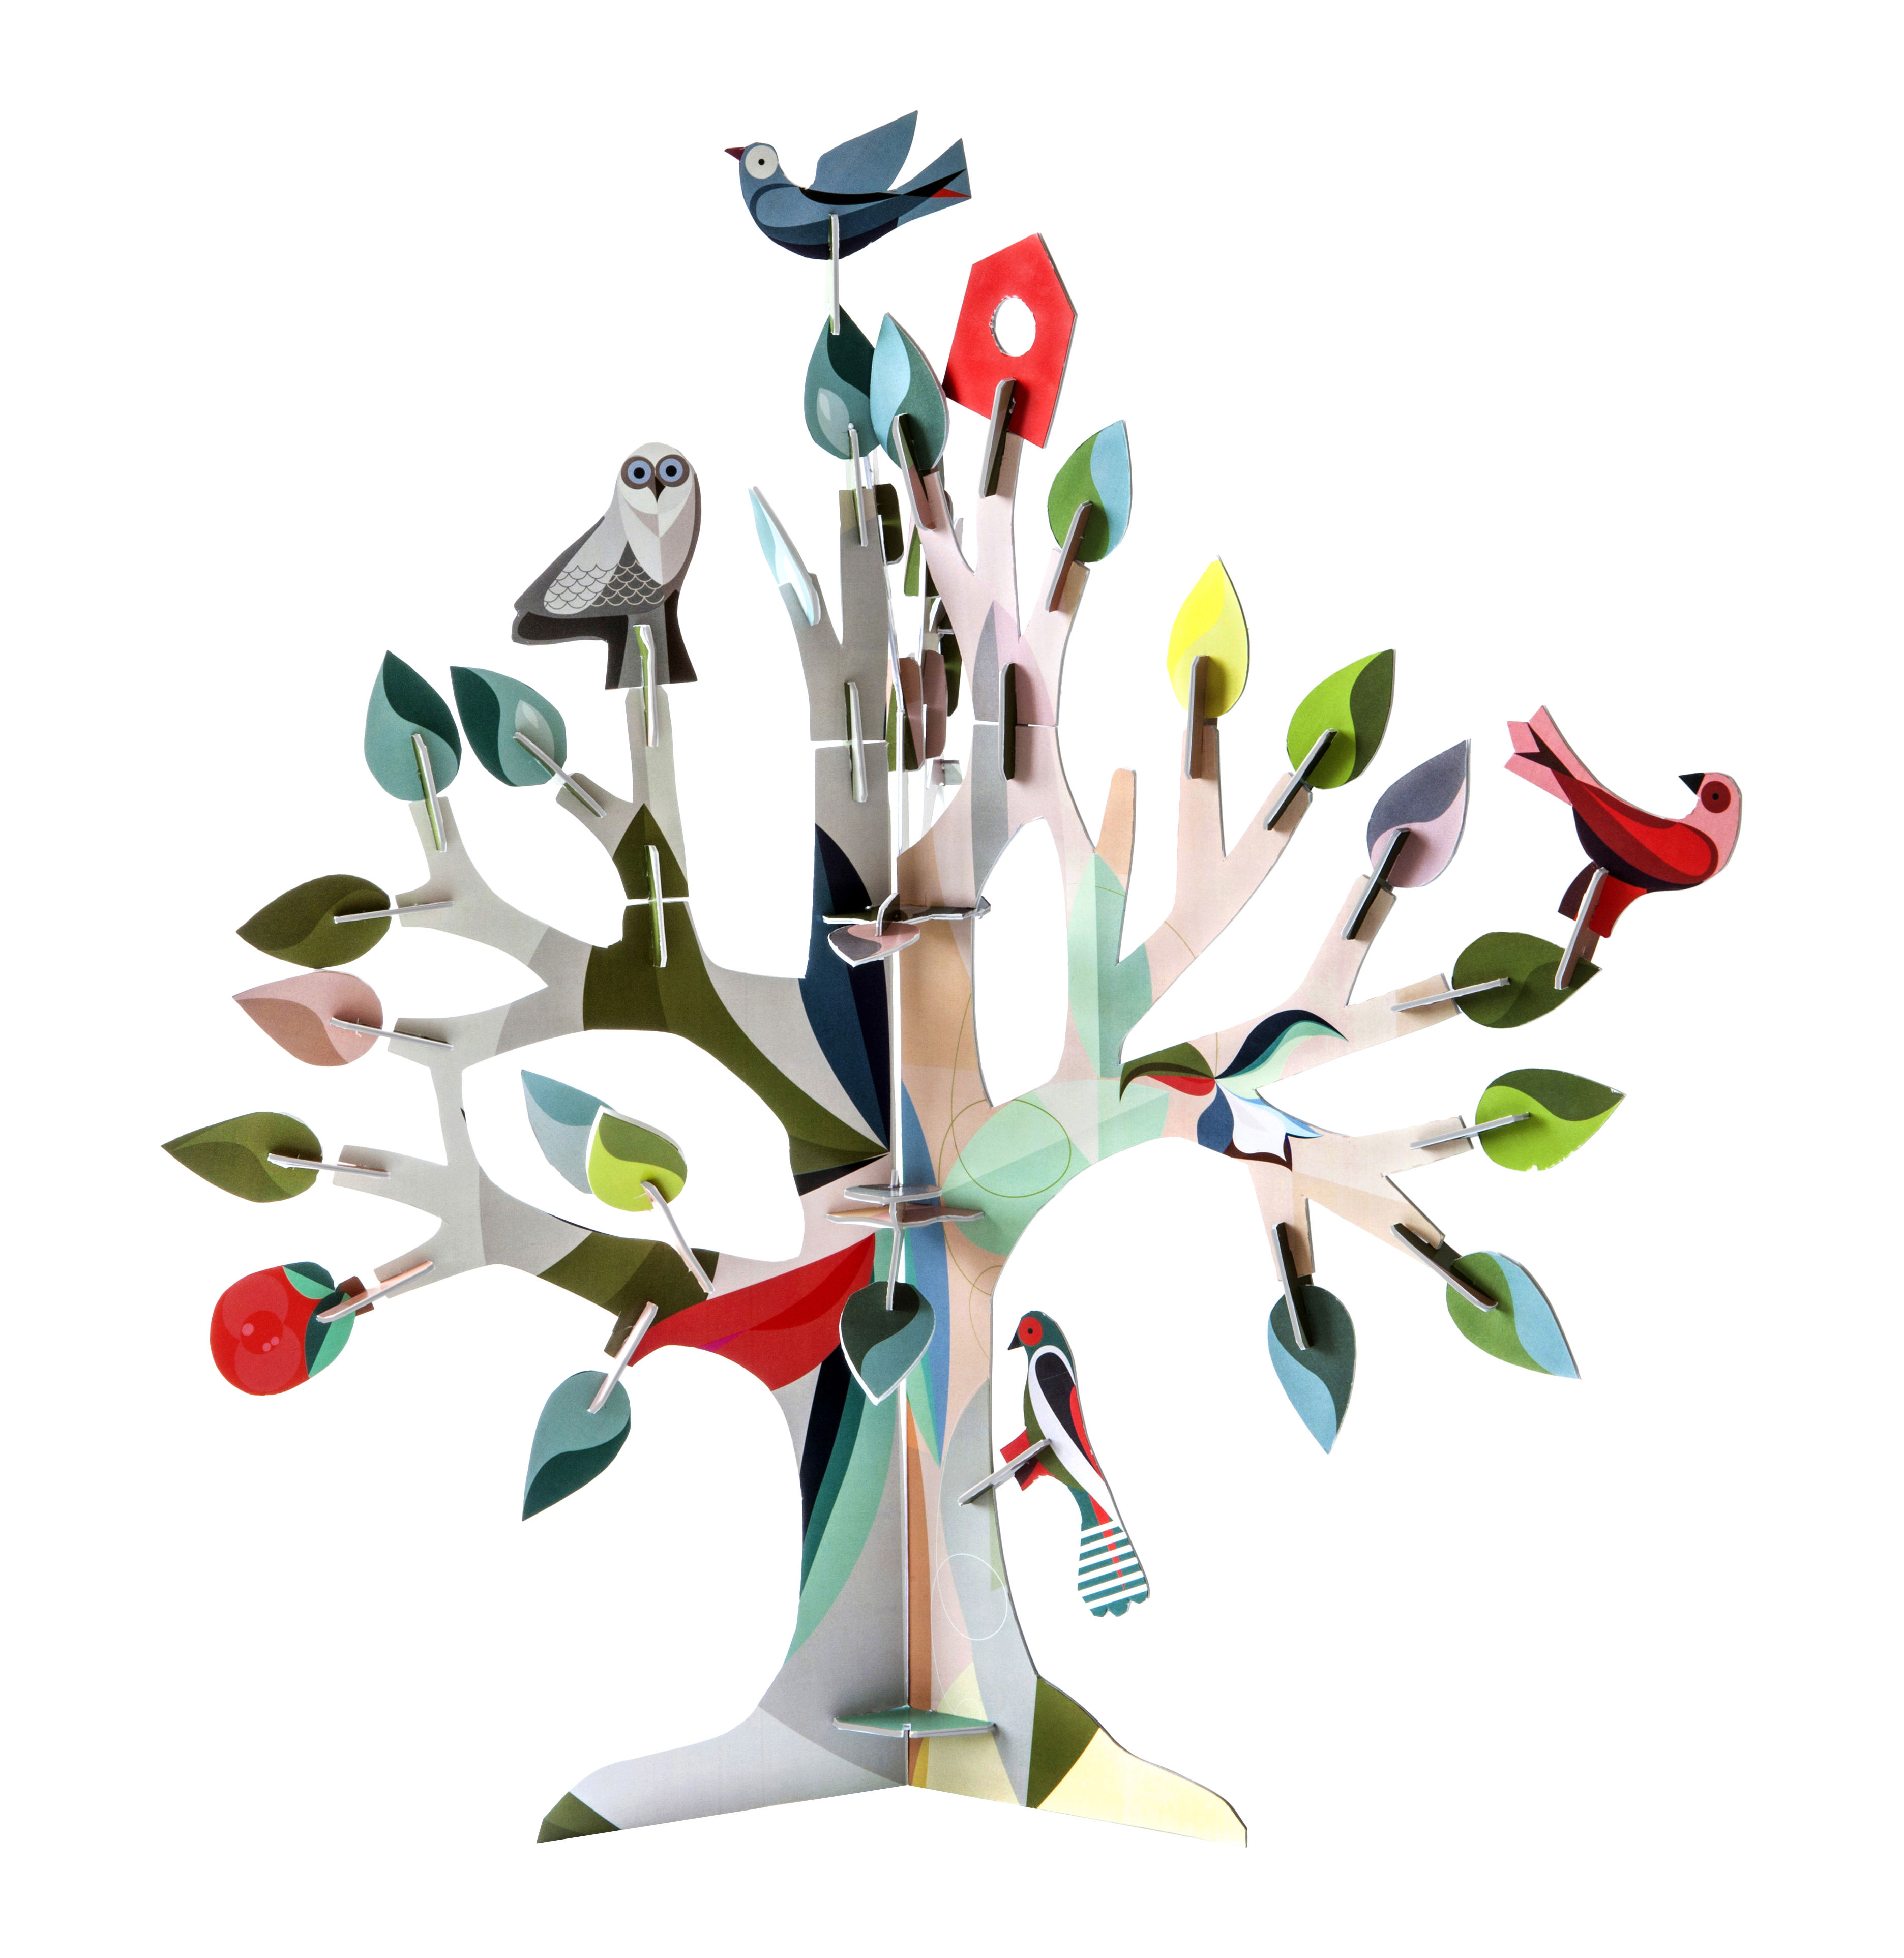 figurine construire totem arbre r ves carton arbre multicolore studio roof made in. Black Bedroom Furniture Sets. Home Design Ideas